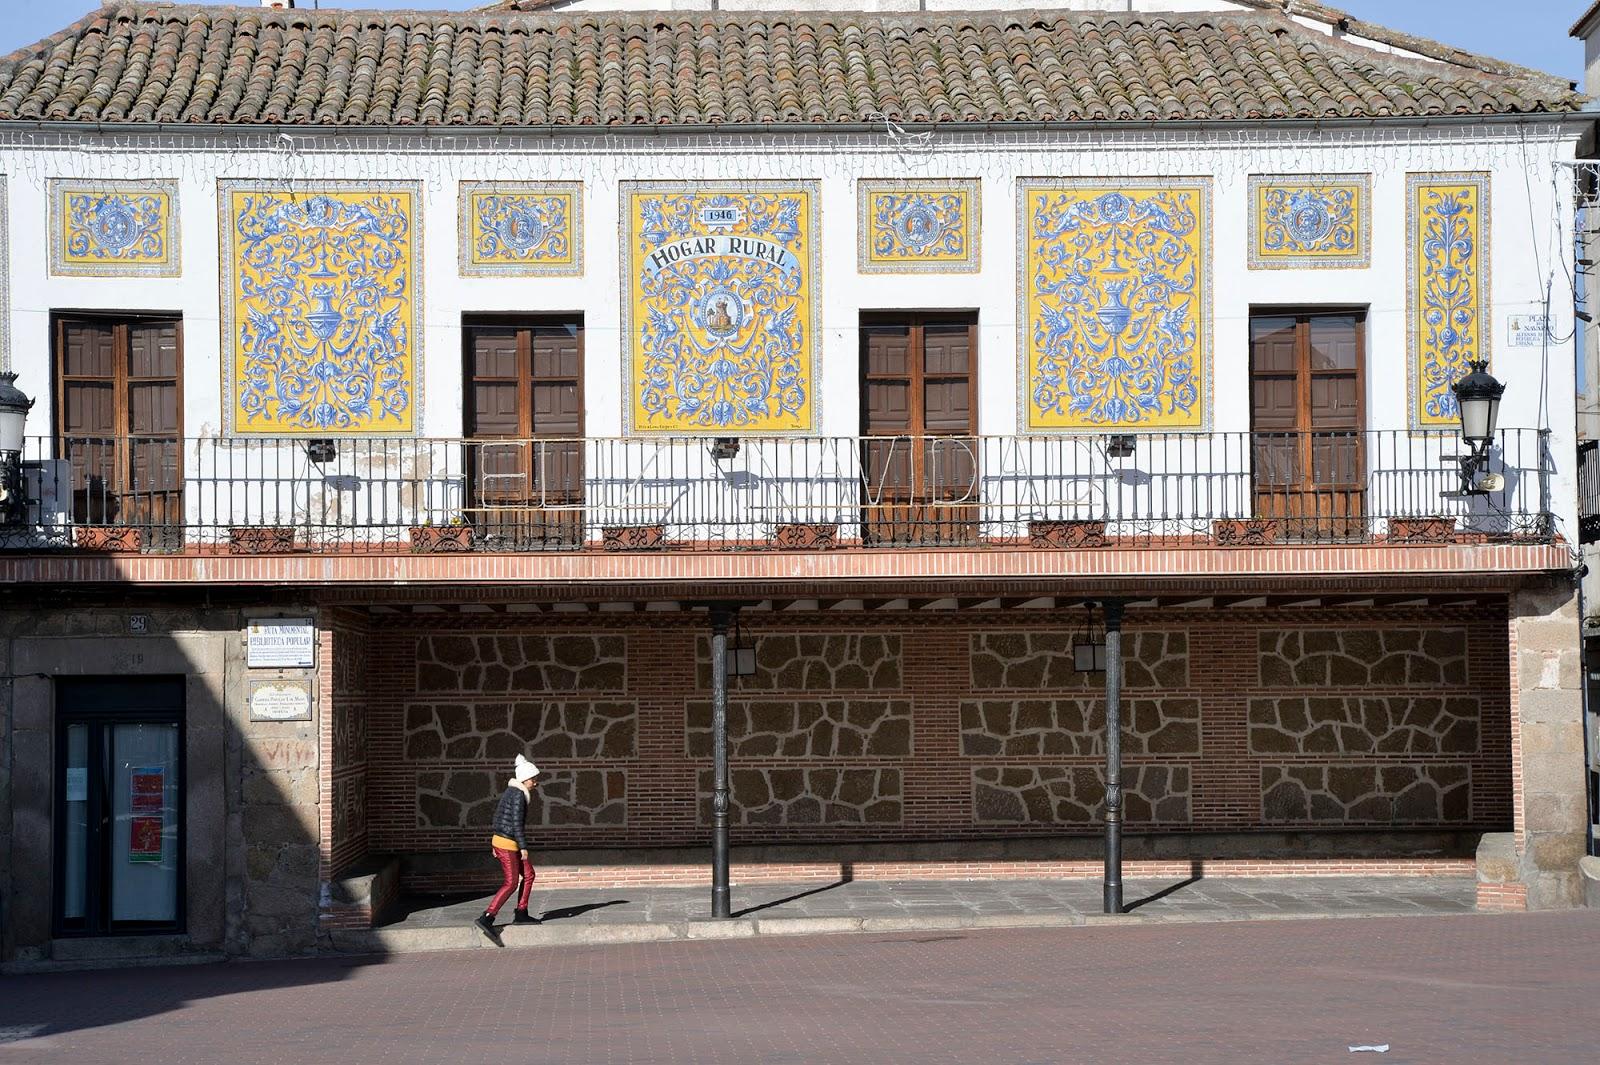 parador oropesa toledo spain history castle luxury hotel